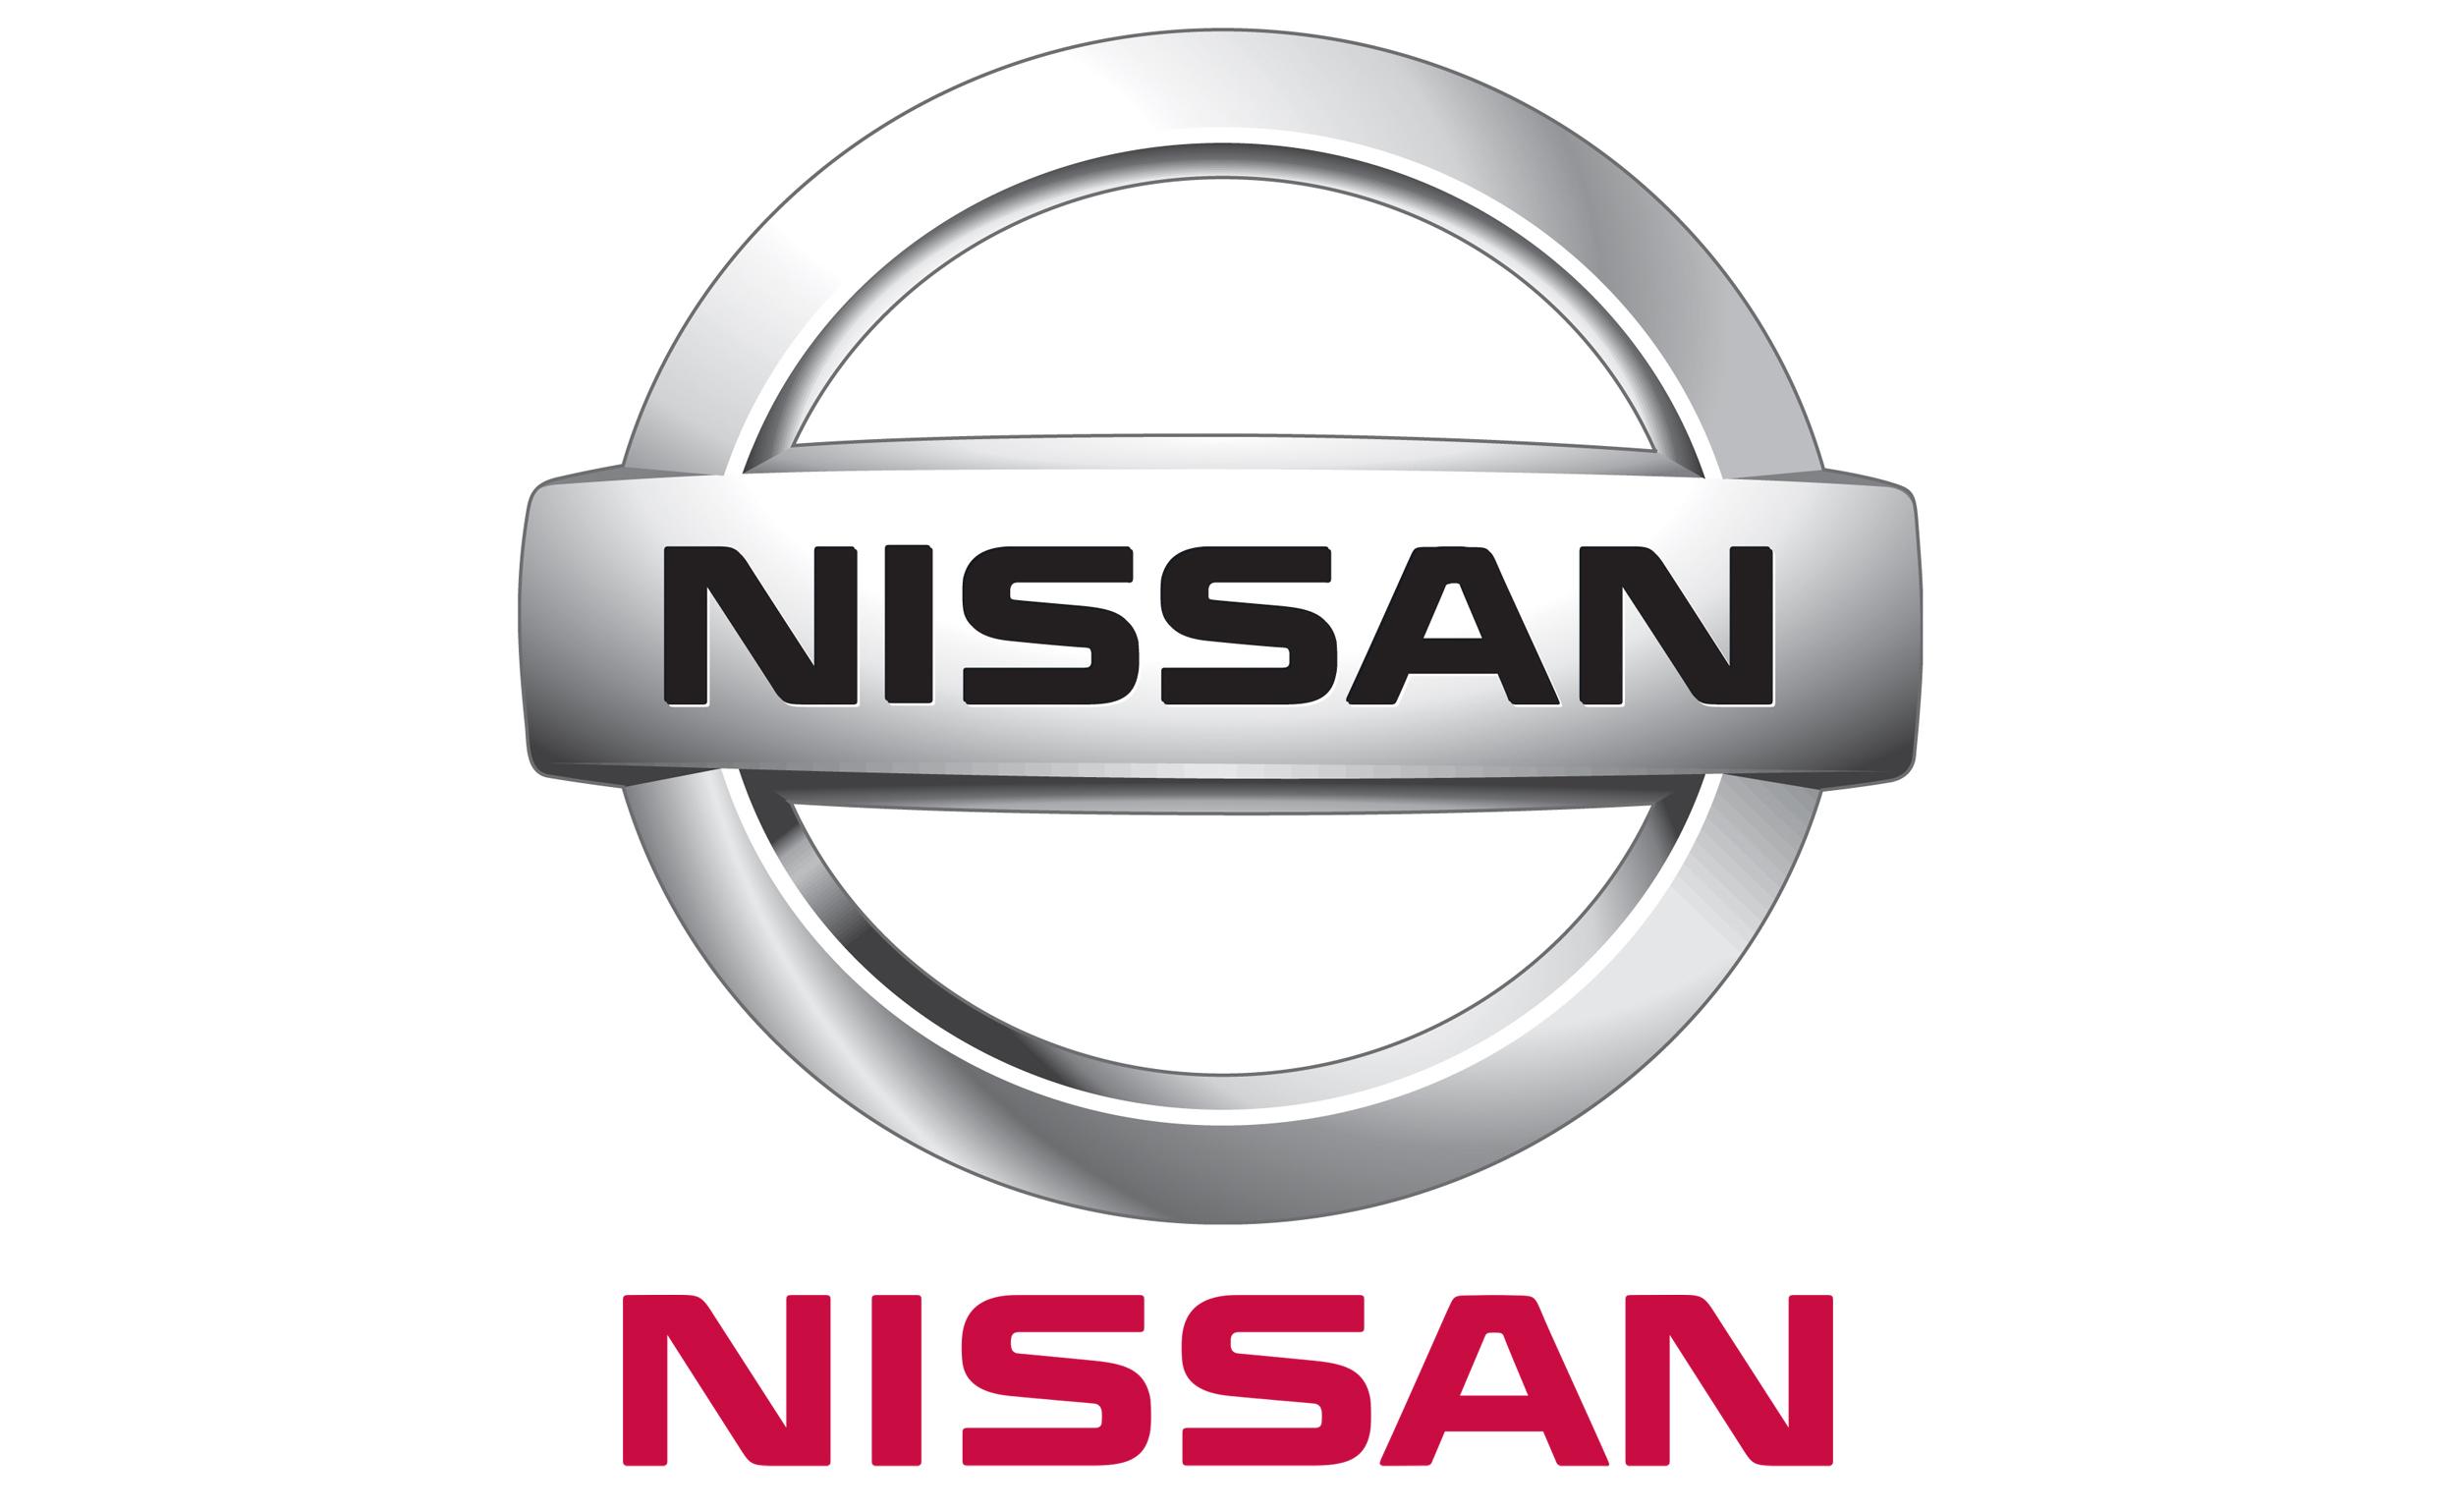 World car brands, car symbols and emblems